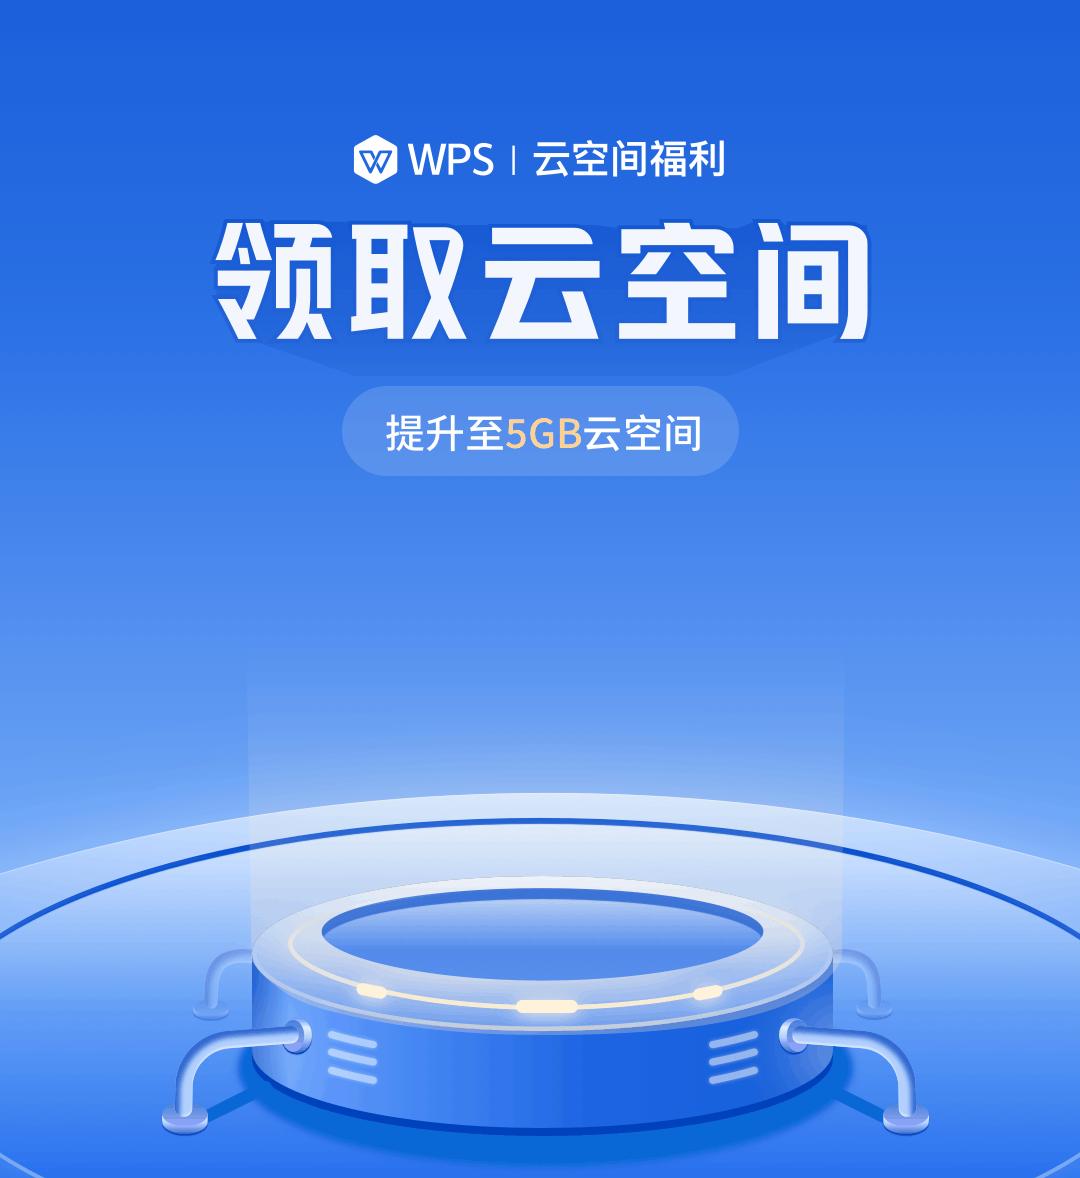 WPS免费领取5GB永久云空间